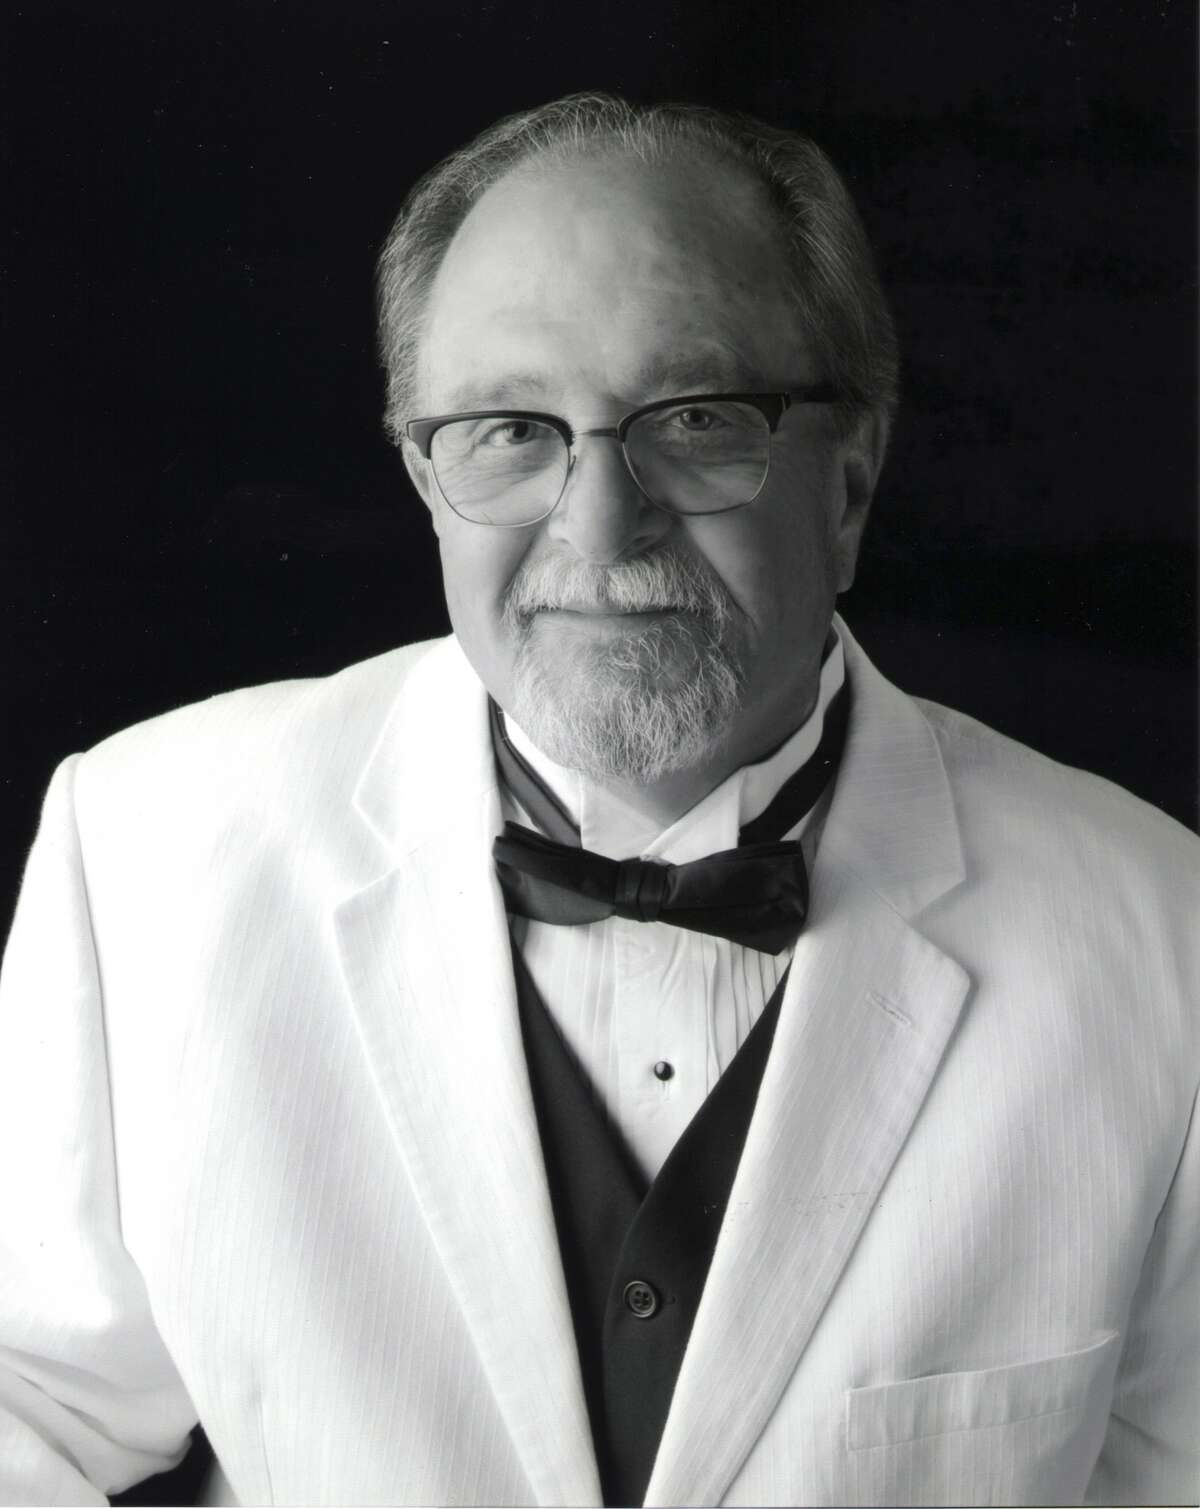 Craig Thomason, former San Antonio Express-News Metro editor, died April 13, 2016. He was 65.